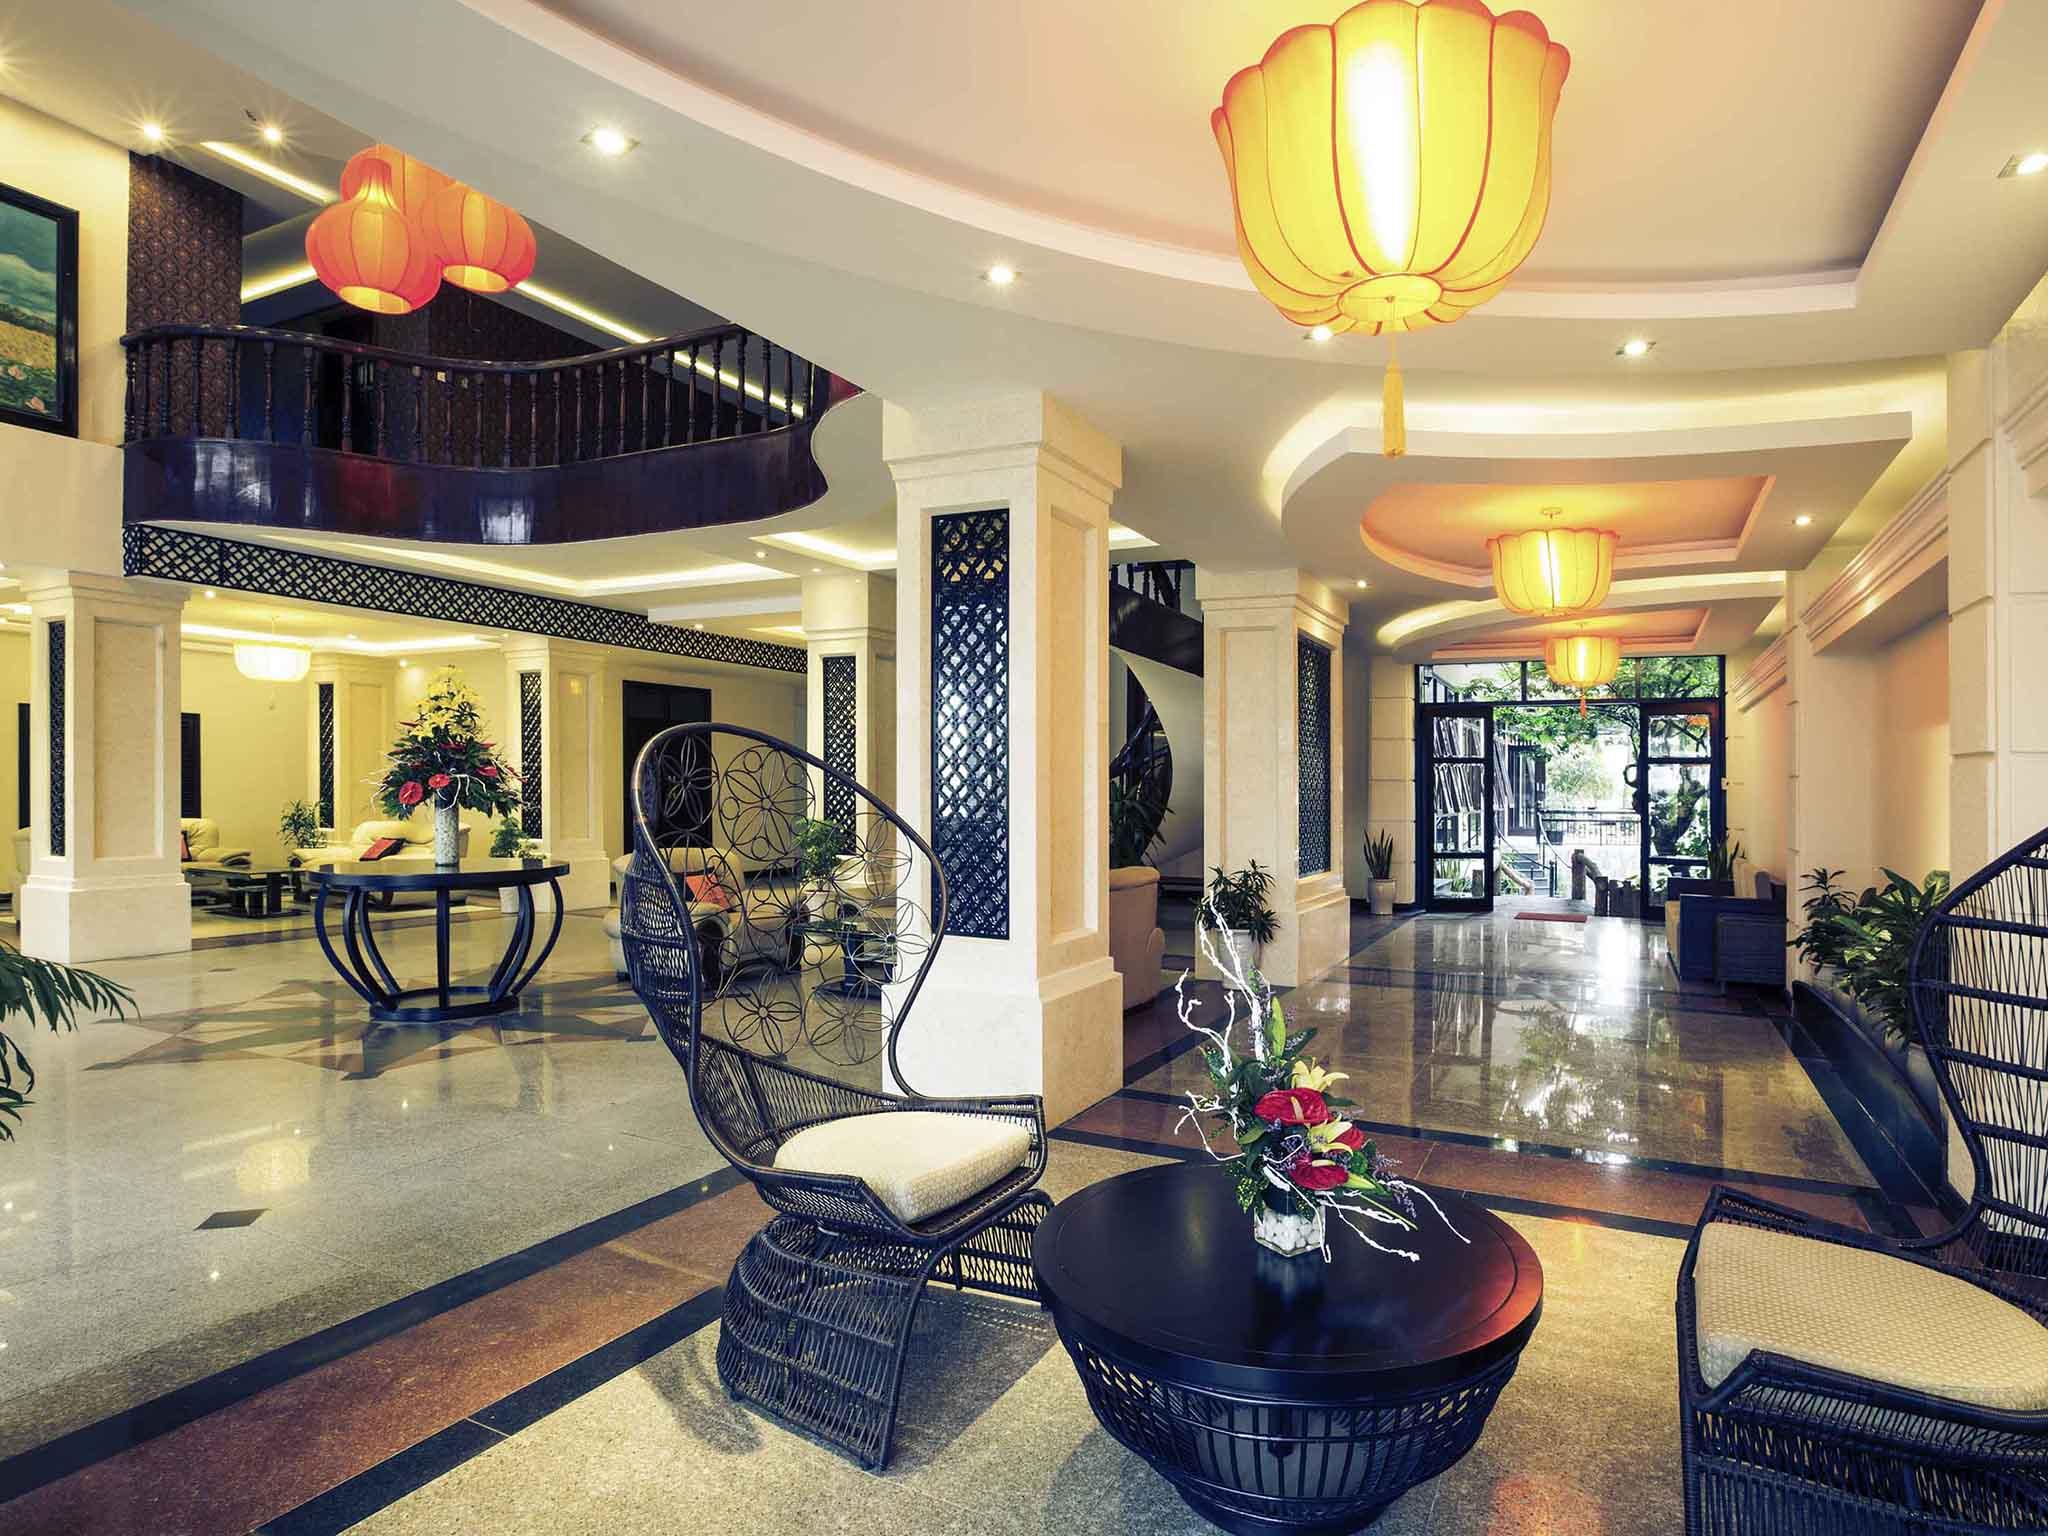 Mercure Hoi An Royal Hotel